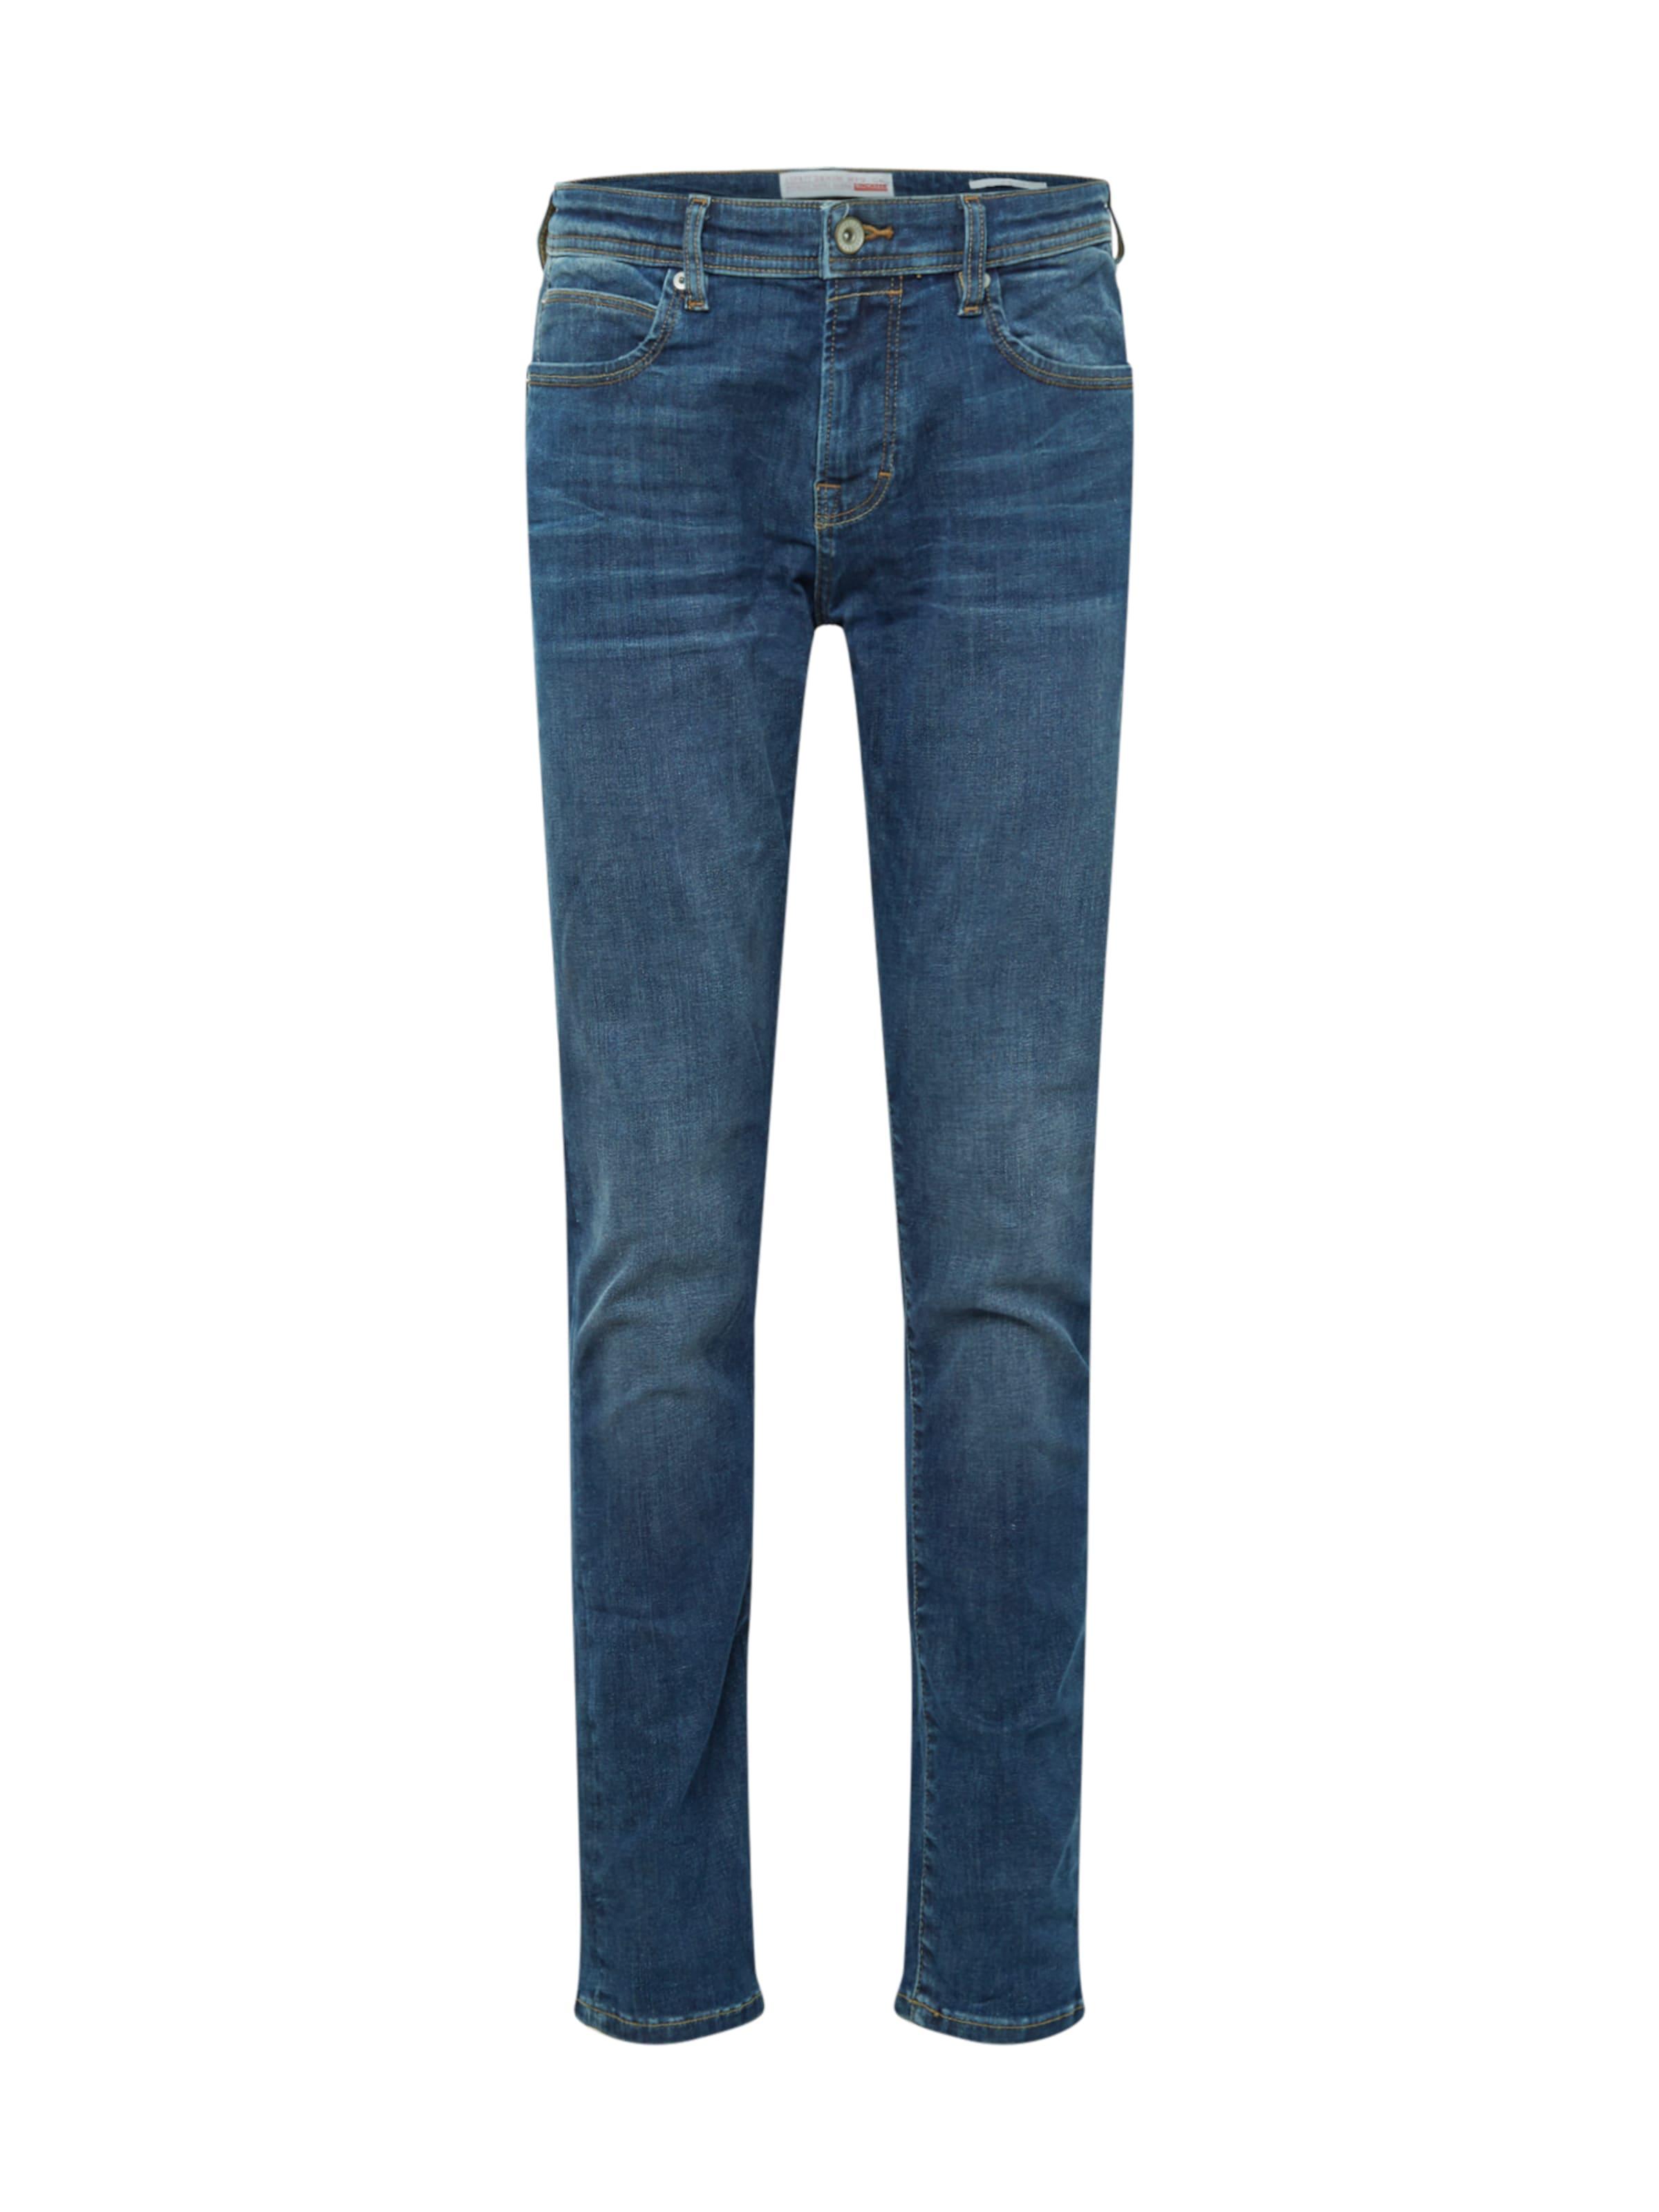 Pants' Esprit Slim Jean En 'rcs Bleu Dynami Denim 80mnNvw